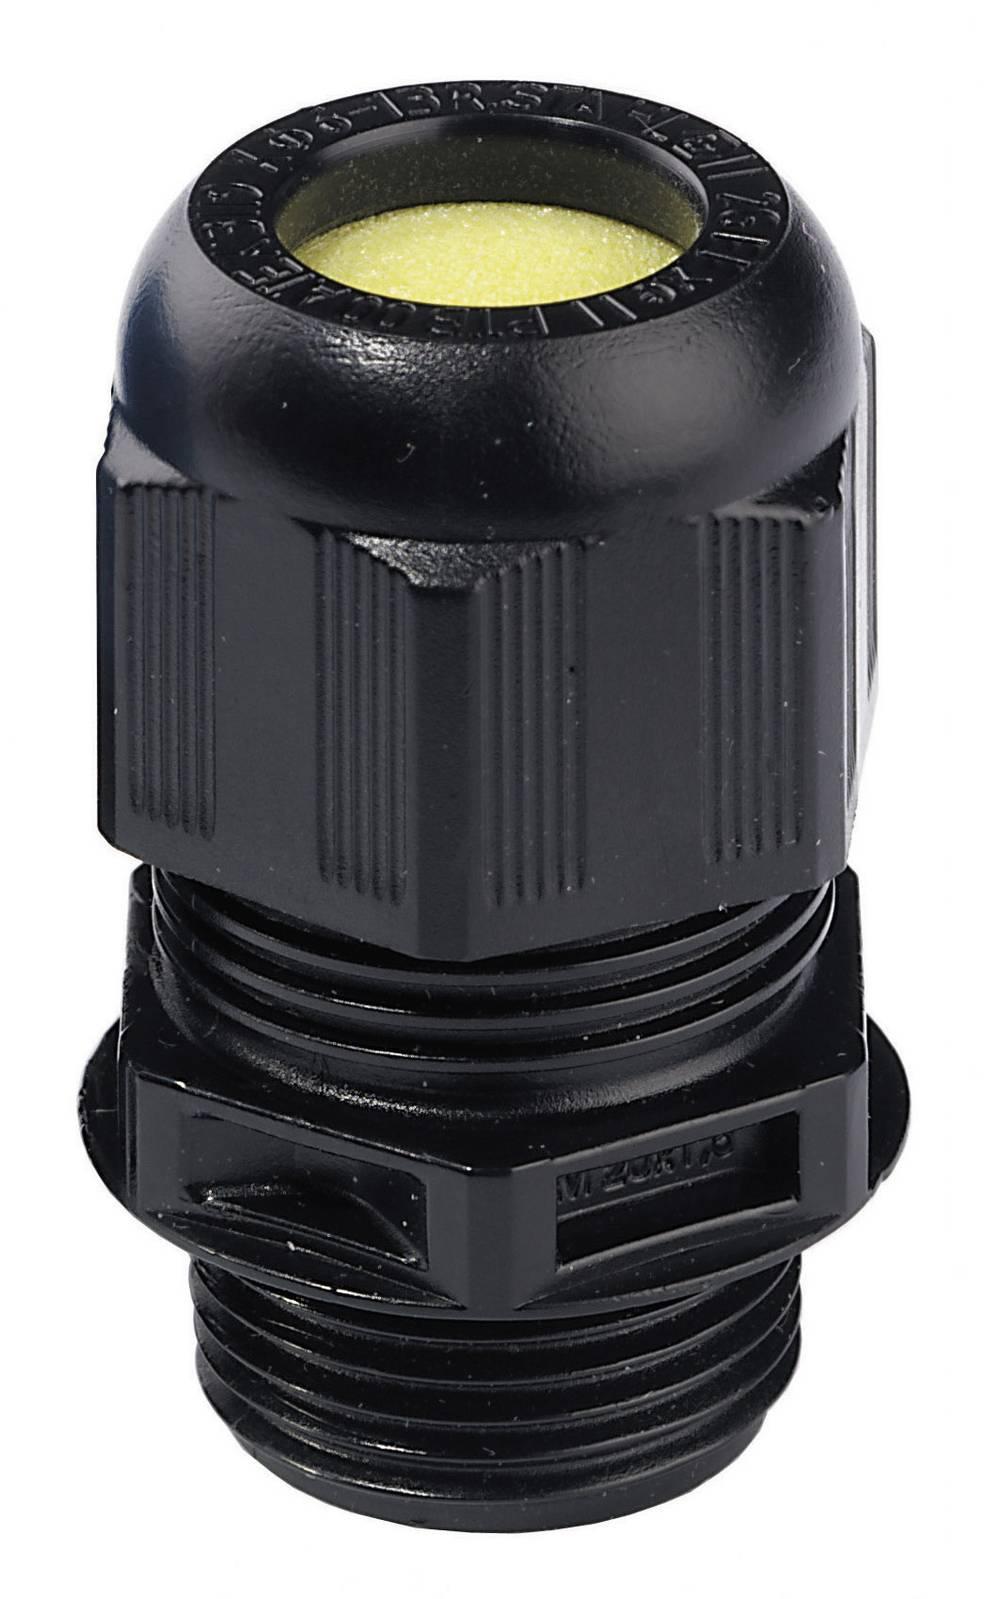 Kabelska uvodnica ATEX M16 crne boje (RAL 9005) Wiska ESKE/1-e M16 1 kom.